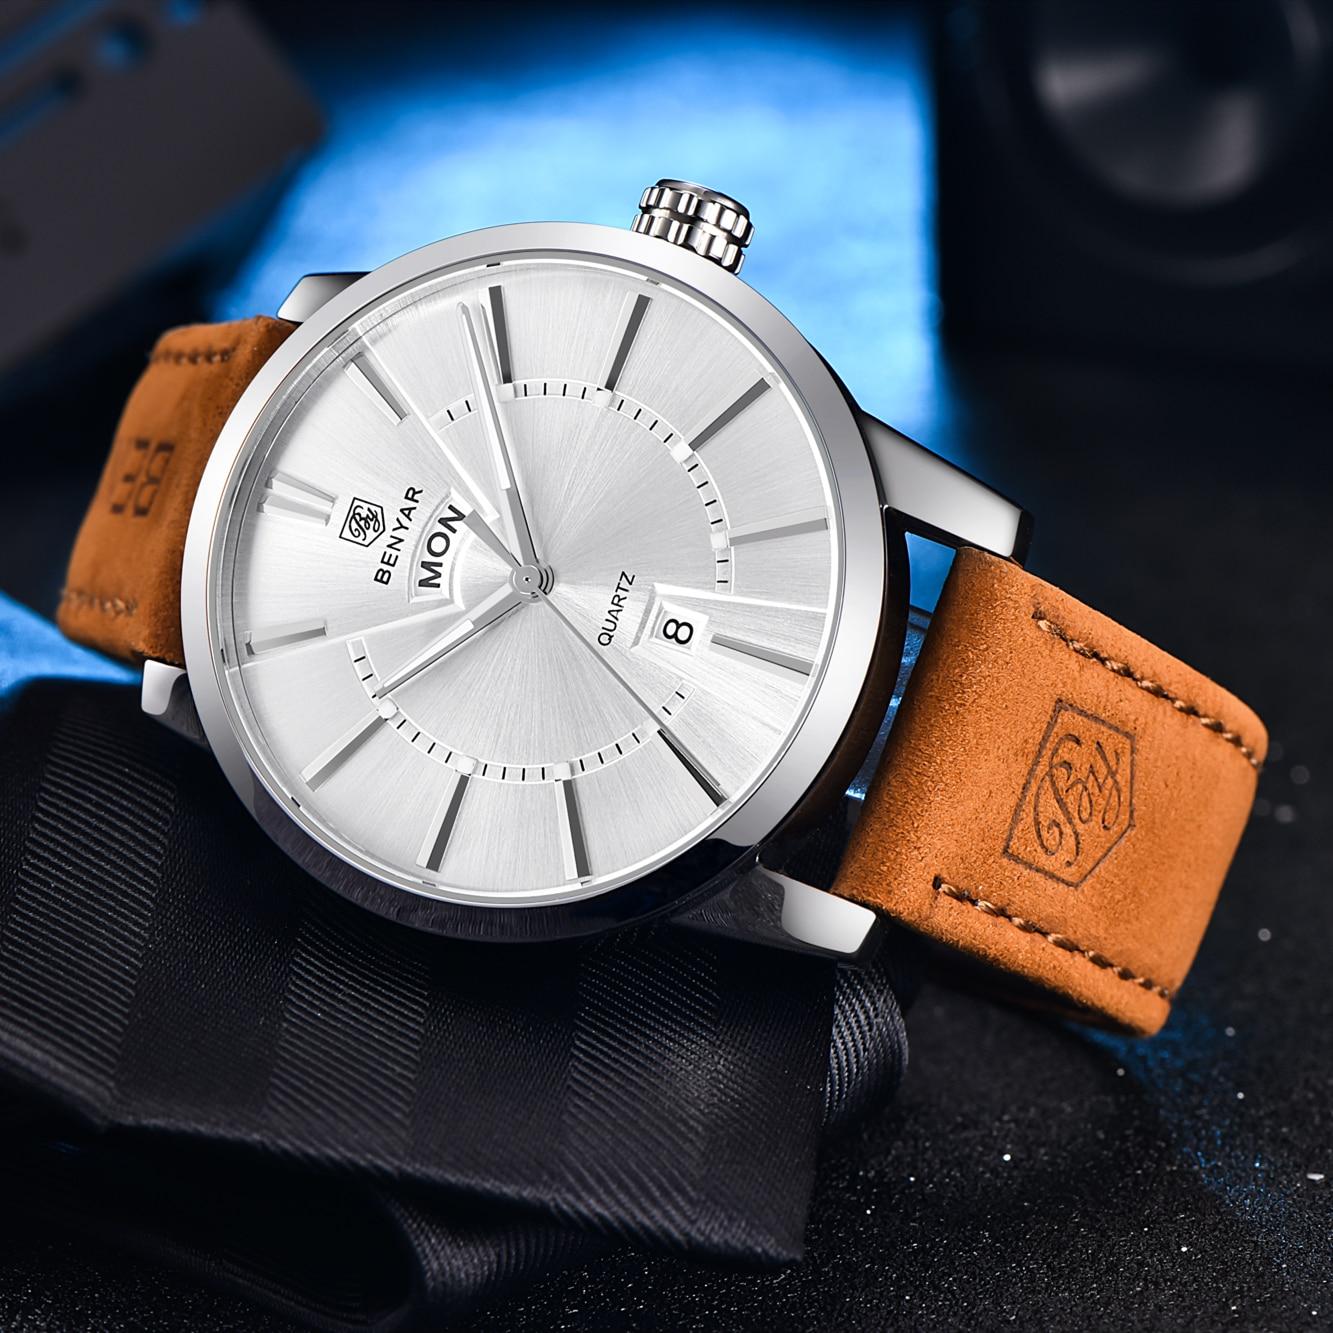 Image 5 - Relogio Masculino BENYAR Luxury Brand  Analog Display Date Mens Quartz Watch 30M Waterproof Genuine Leather Strap Casual Watchclock ipodwatch reportclock rugby -